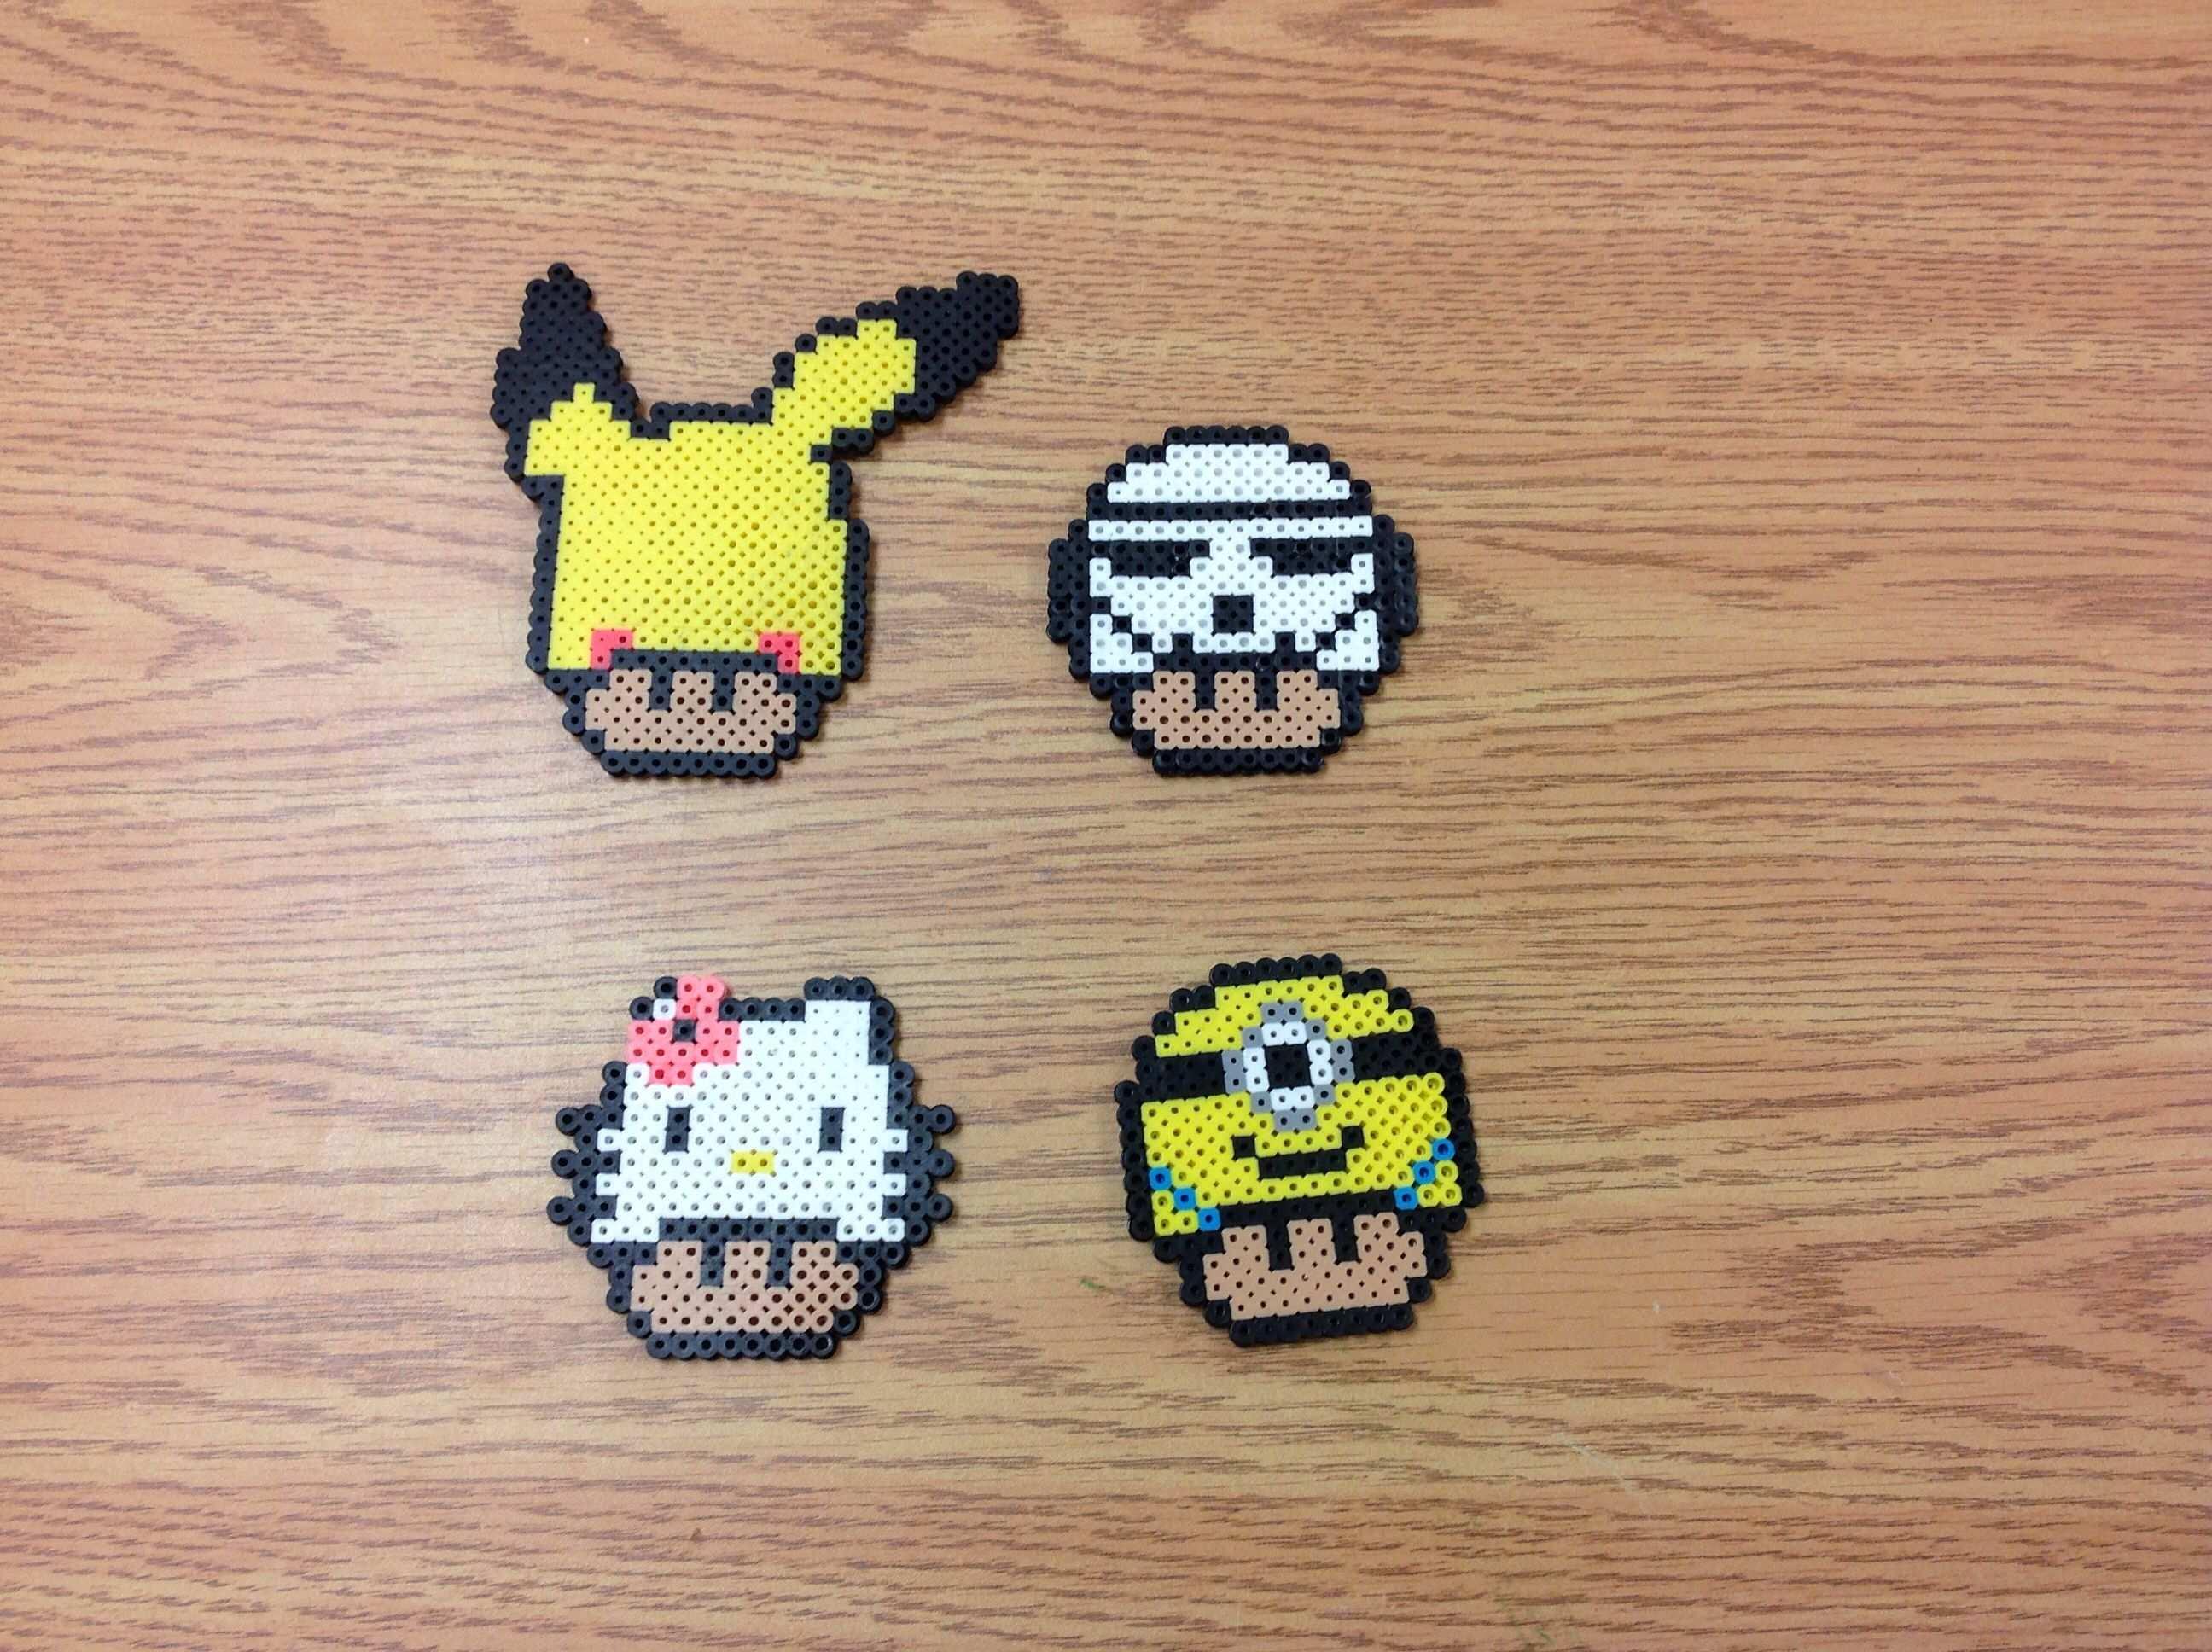 Mushrooms Pikachu Storm Trooper Hello Kitty And Minion Perler Beads By Amanda Collison Perler Bead Mario Perler Patterns Japan Crafts